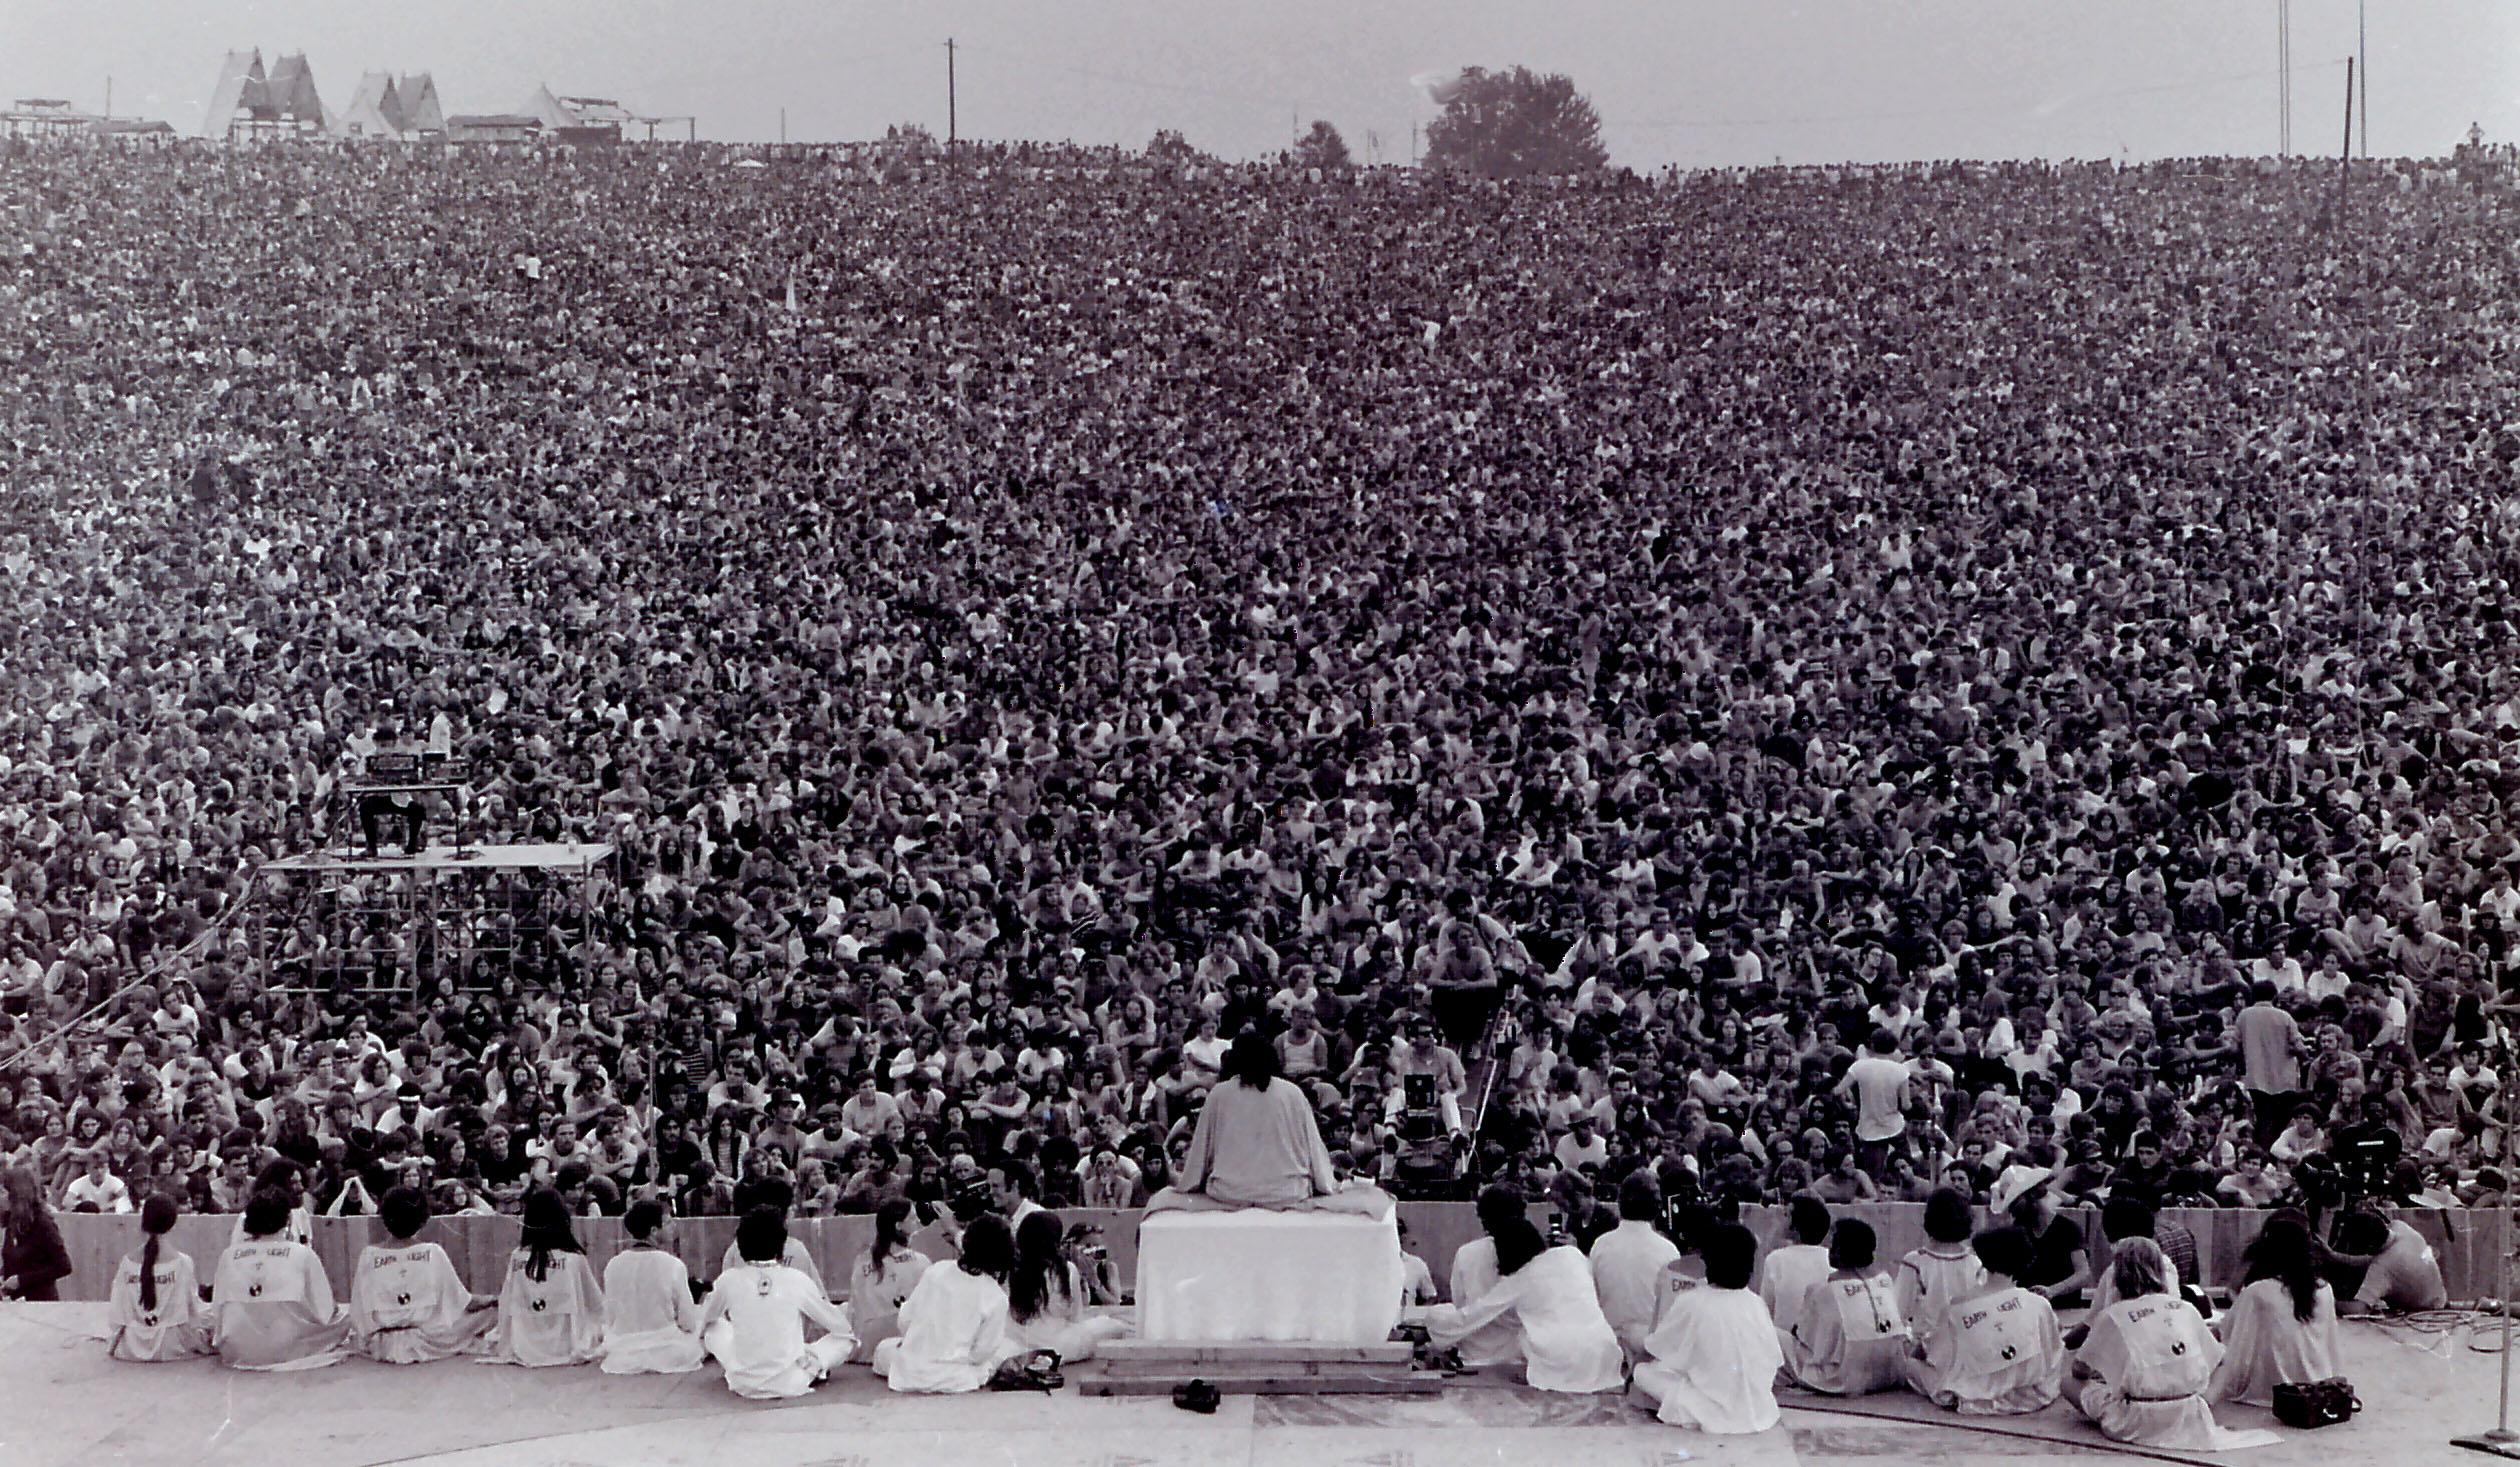 Woodstock '69, Festival Dell'incredibile